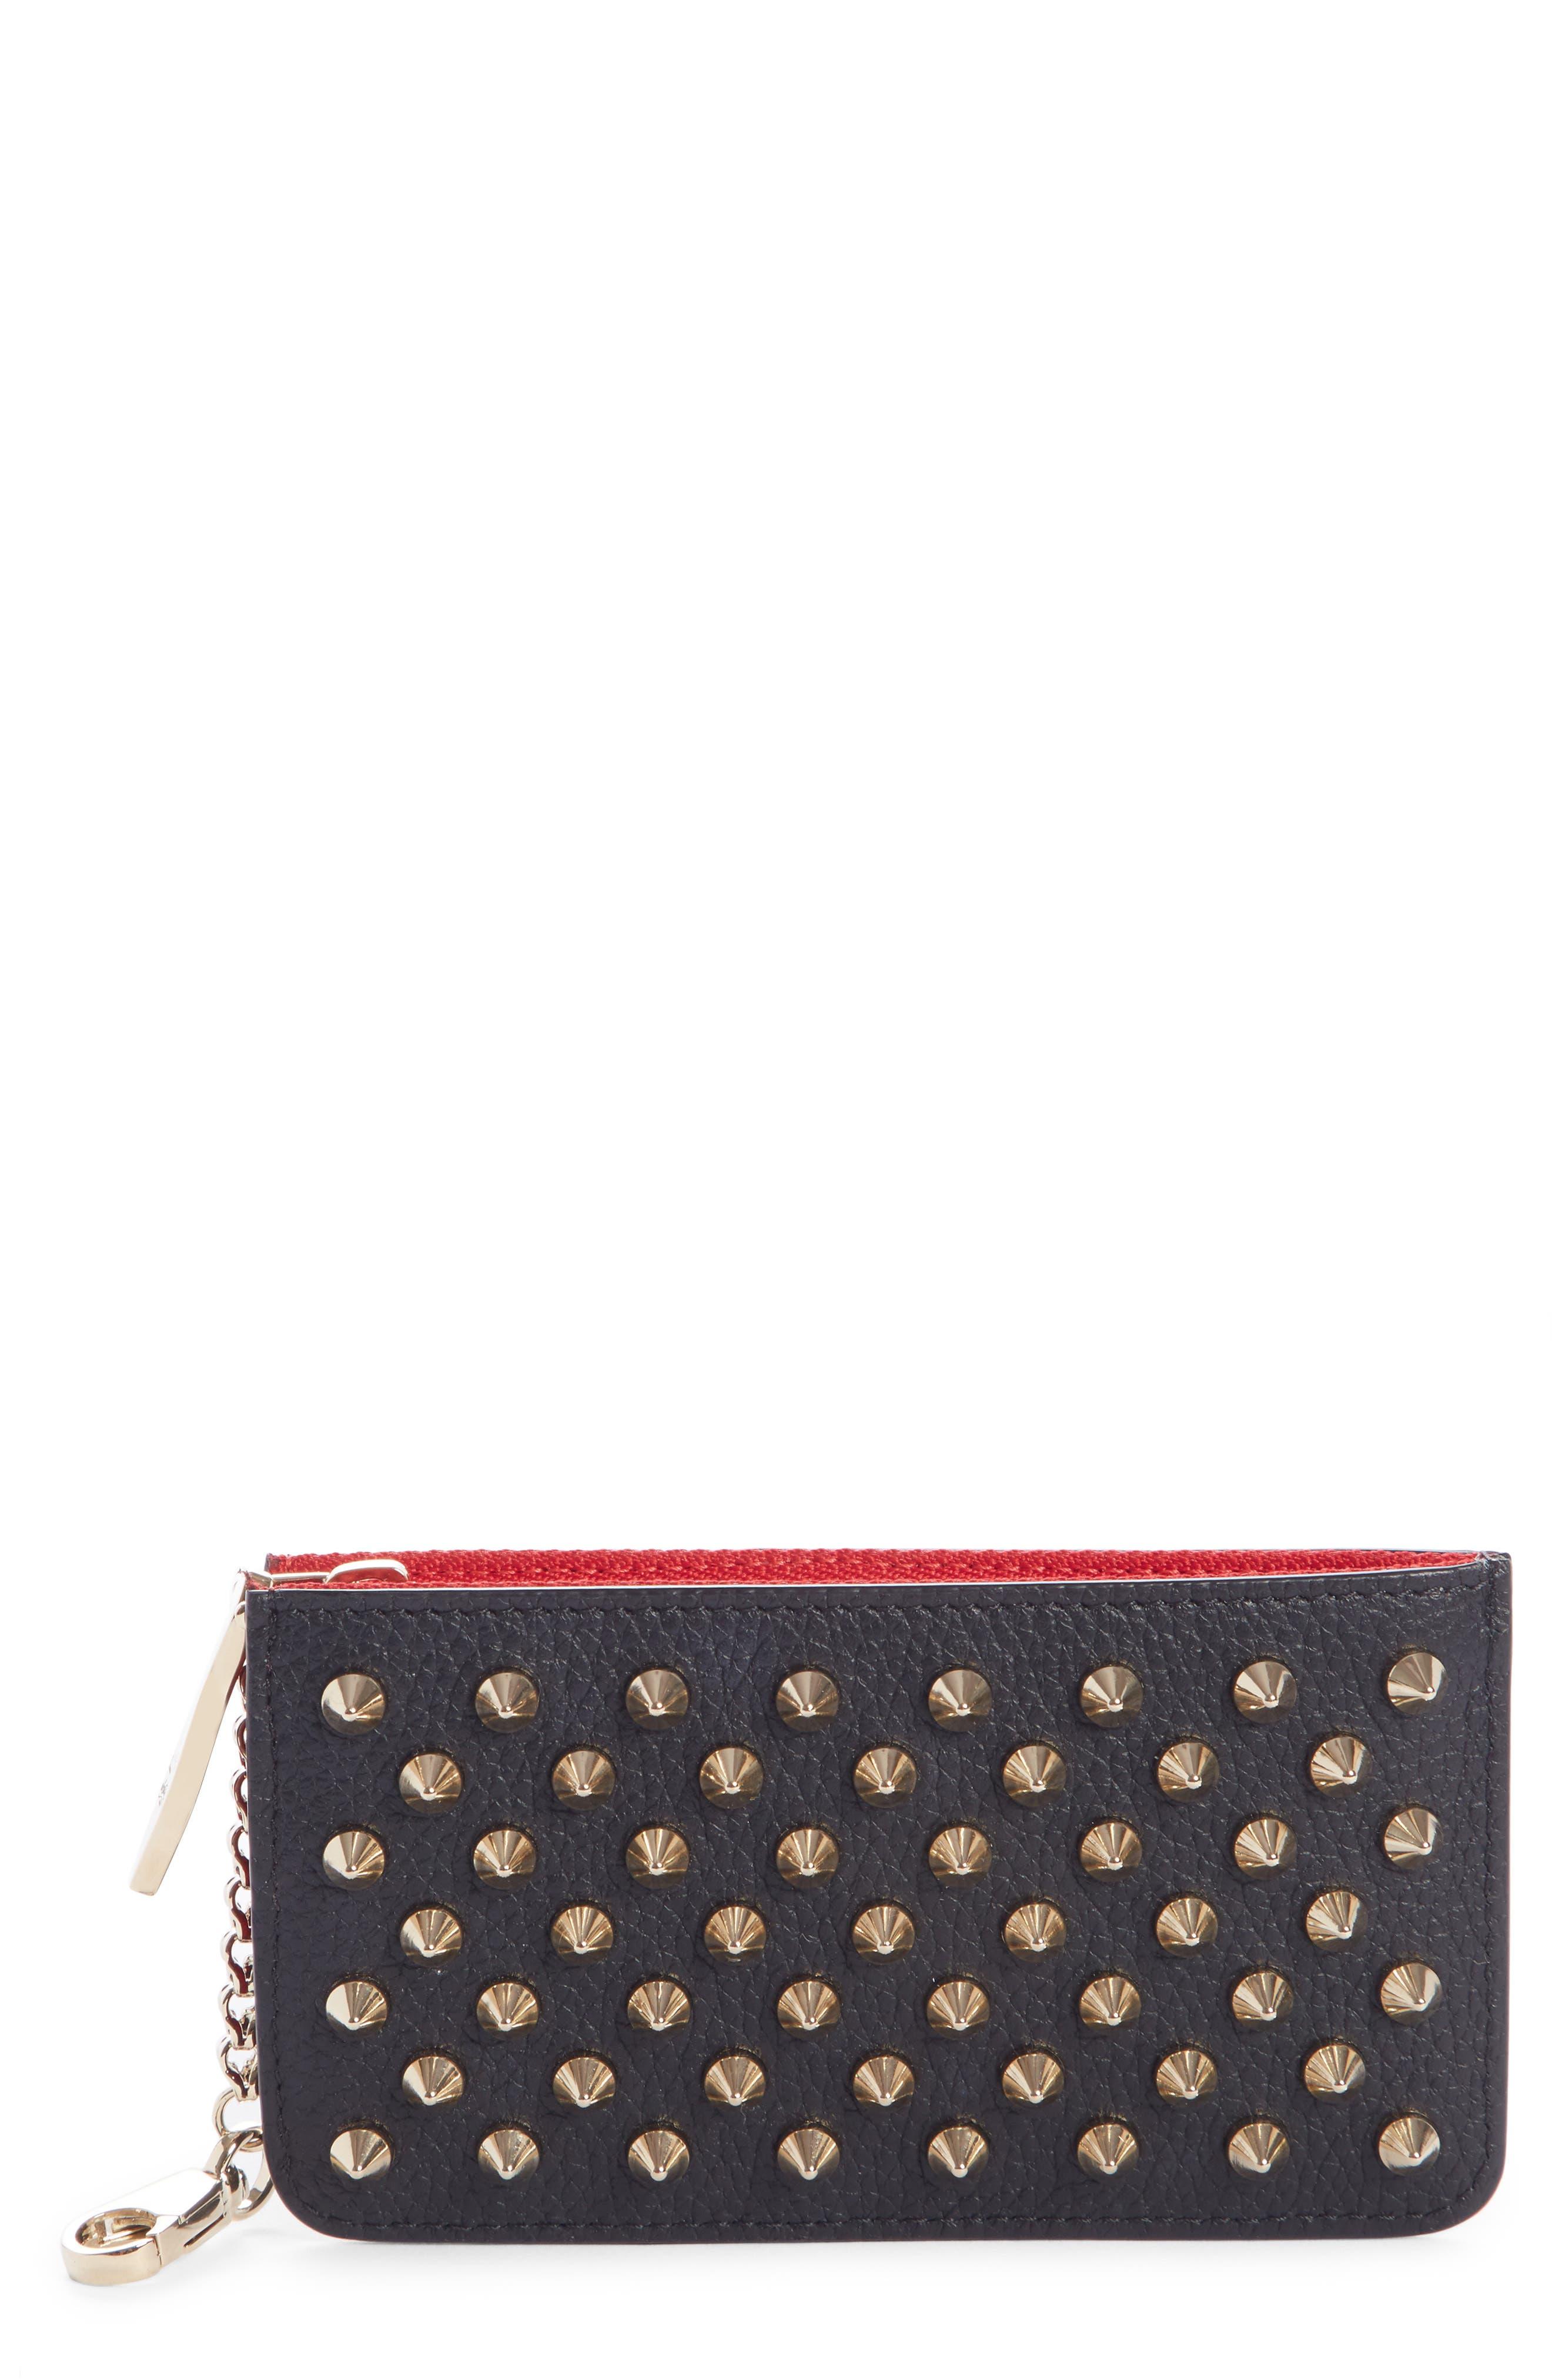 CHRISTIAN LOUBOUTIN, Credilou Calfskin Leather Zip Card Case, Main thumbnail 1, color, BLACK/ GOLD